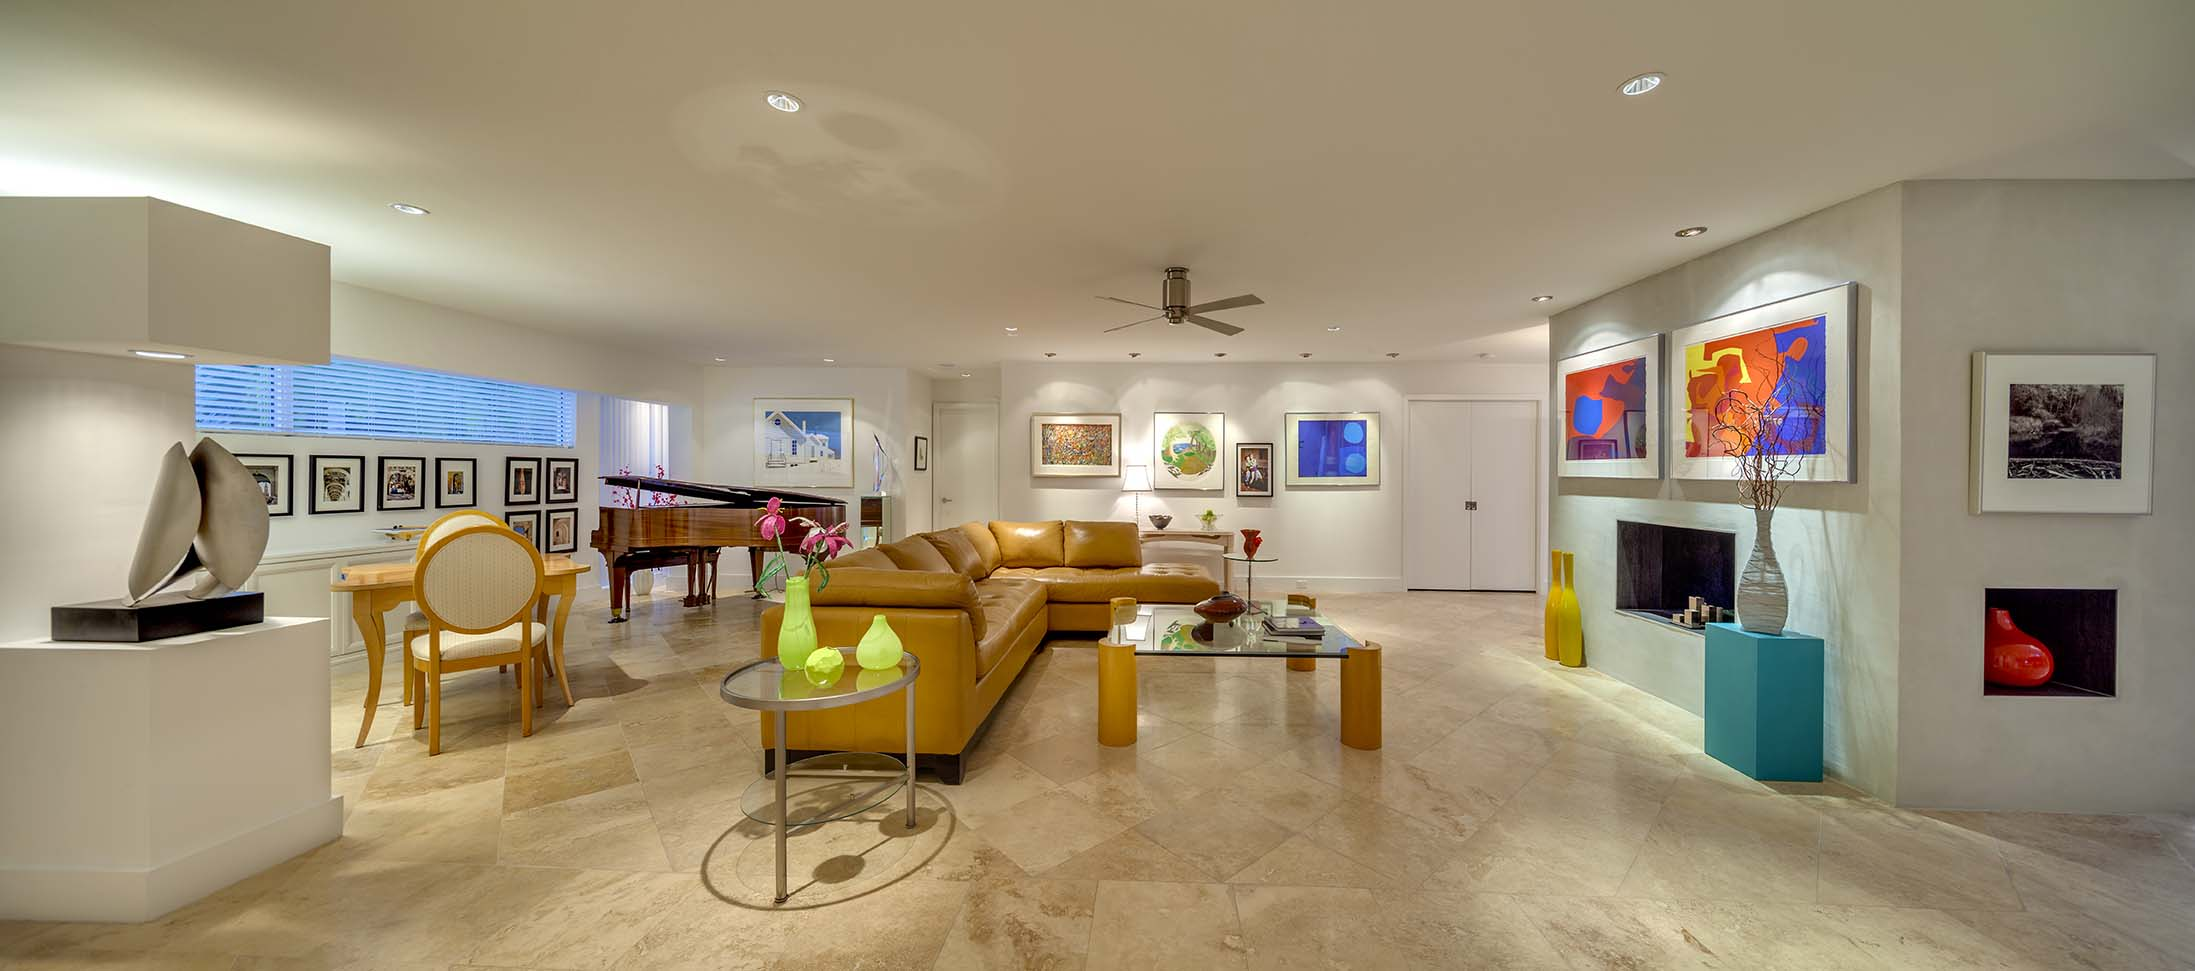 Solstice_Architects_Berman_Residence03.jpg